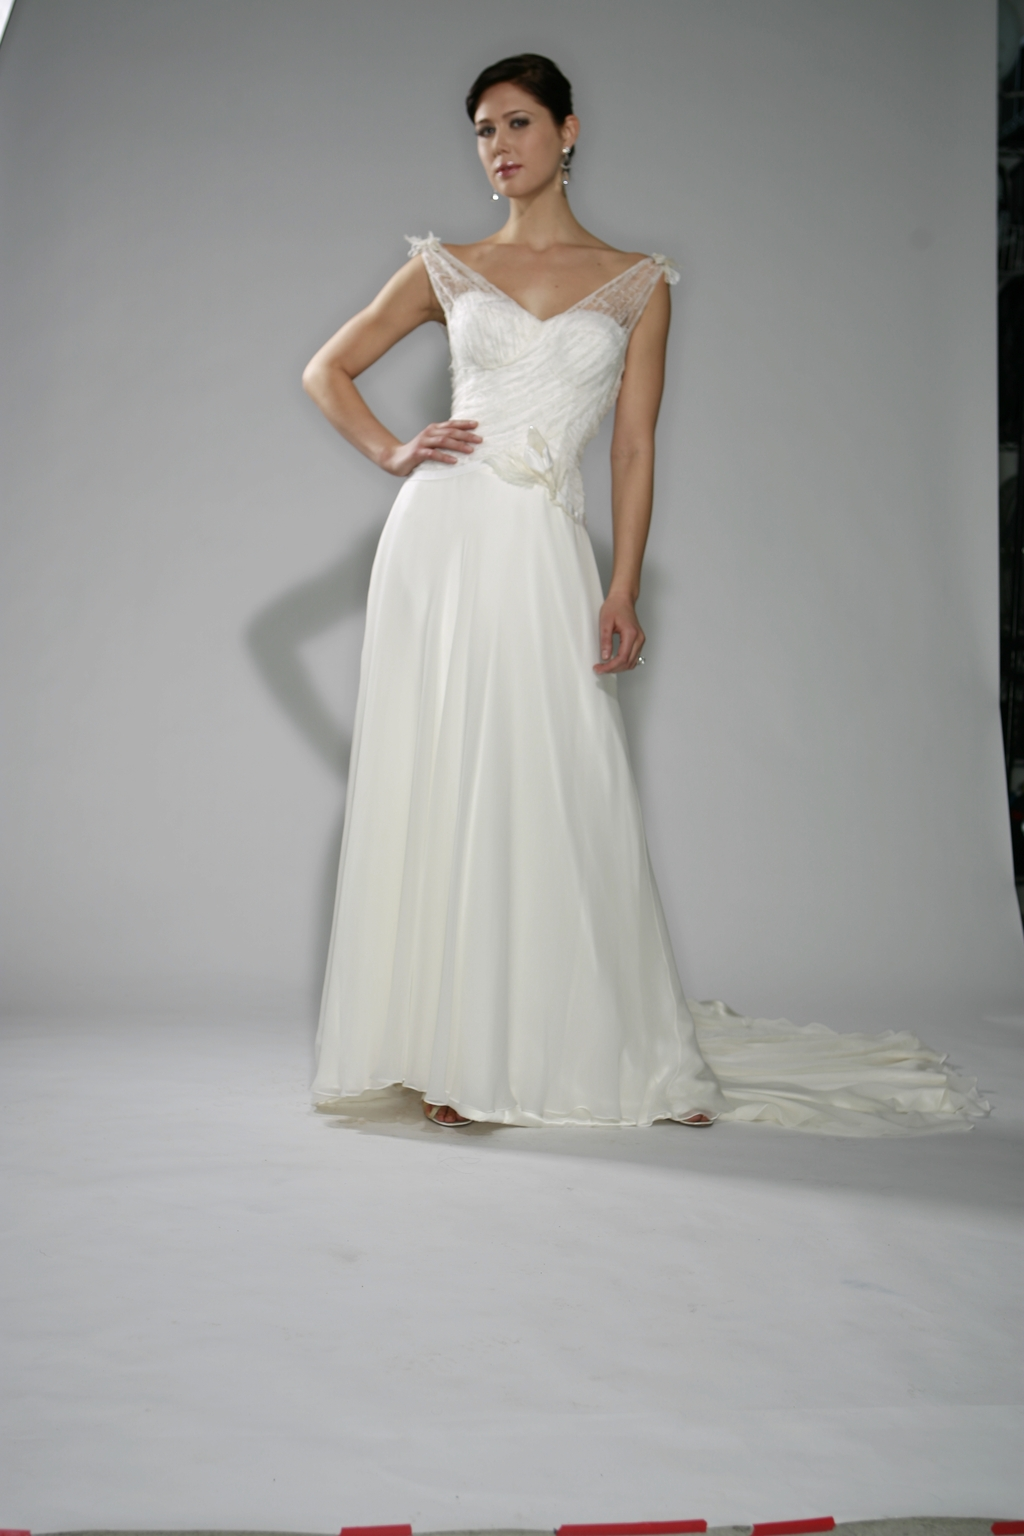 Isolde_spring_2010_wedding-dress-illusion-straps.full